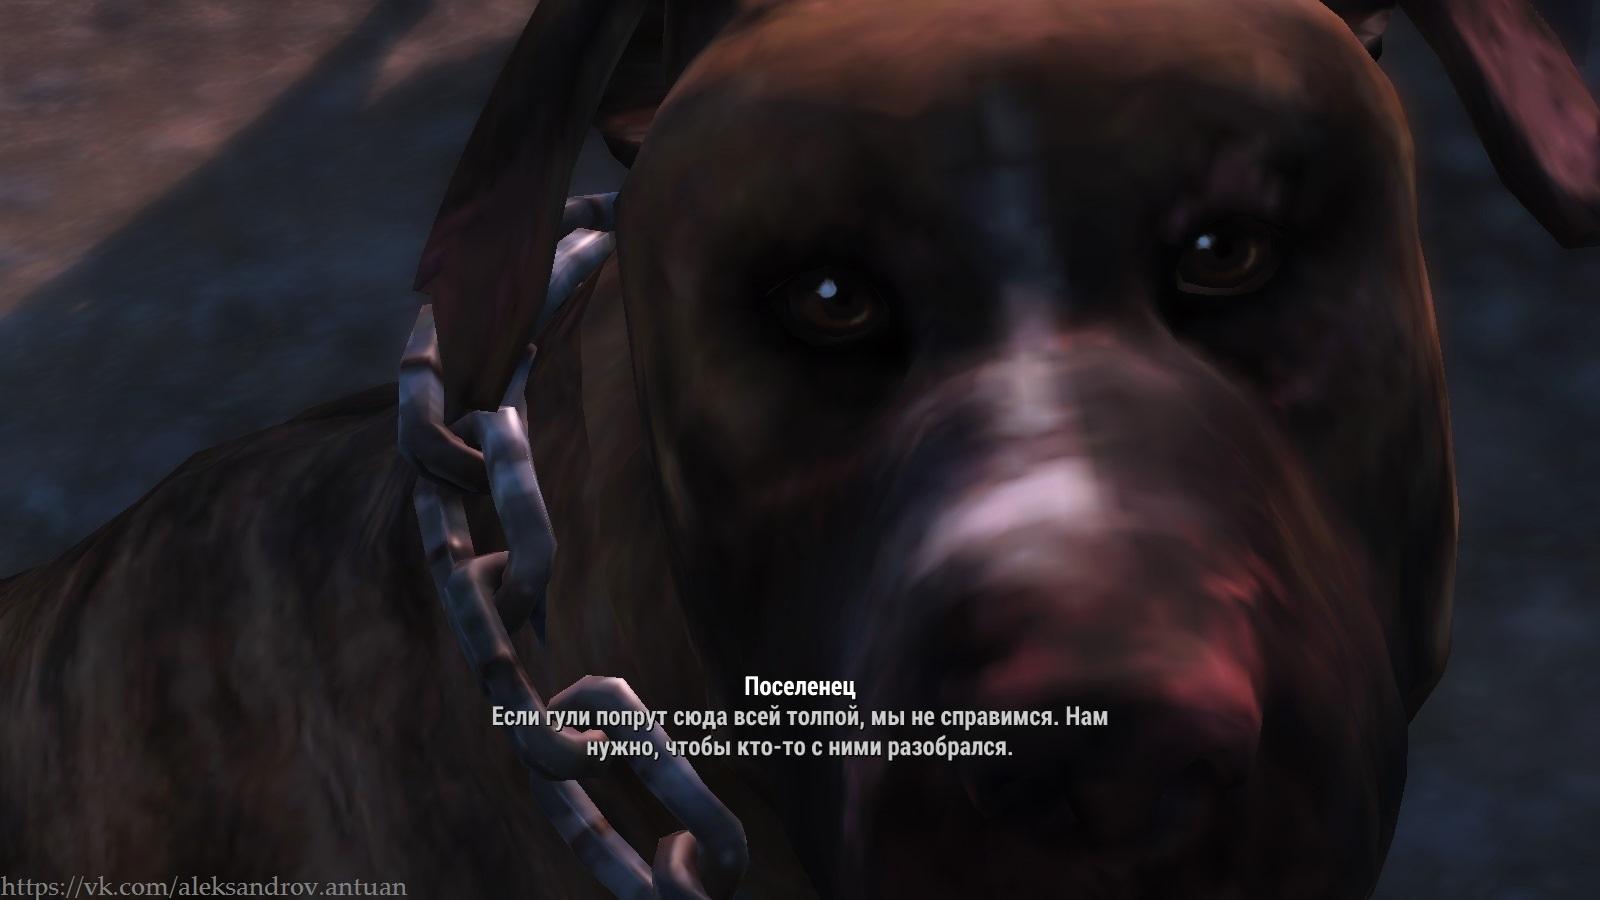 Собака-поселенец. Оборотень ? Скрин не фейковый ... #2 - Fallout 4 поселенец, собака